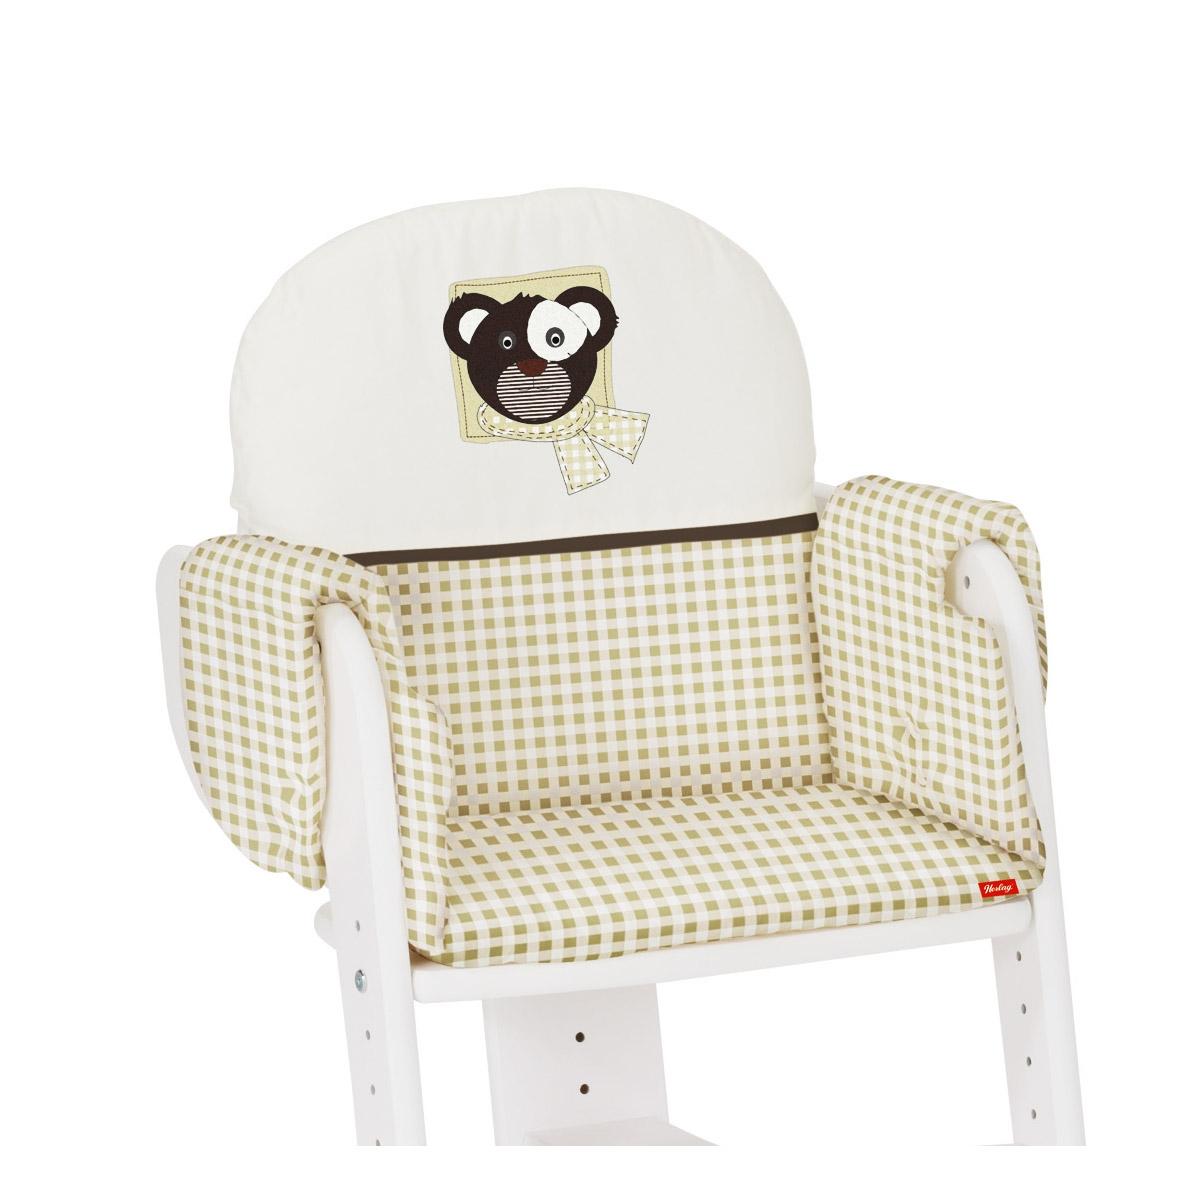 herlag sitzpolster f r hochstuhl tipp topp iv design 2014 farbe w hlbar ebay. Black Bedroom Furniture Sets. Home Design Ideas